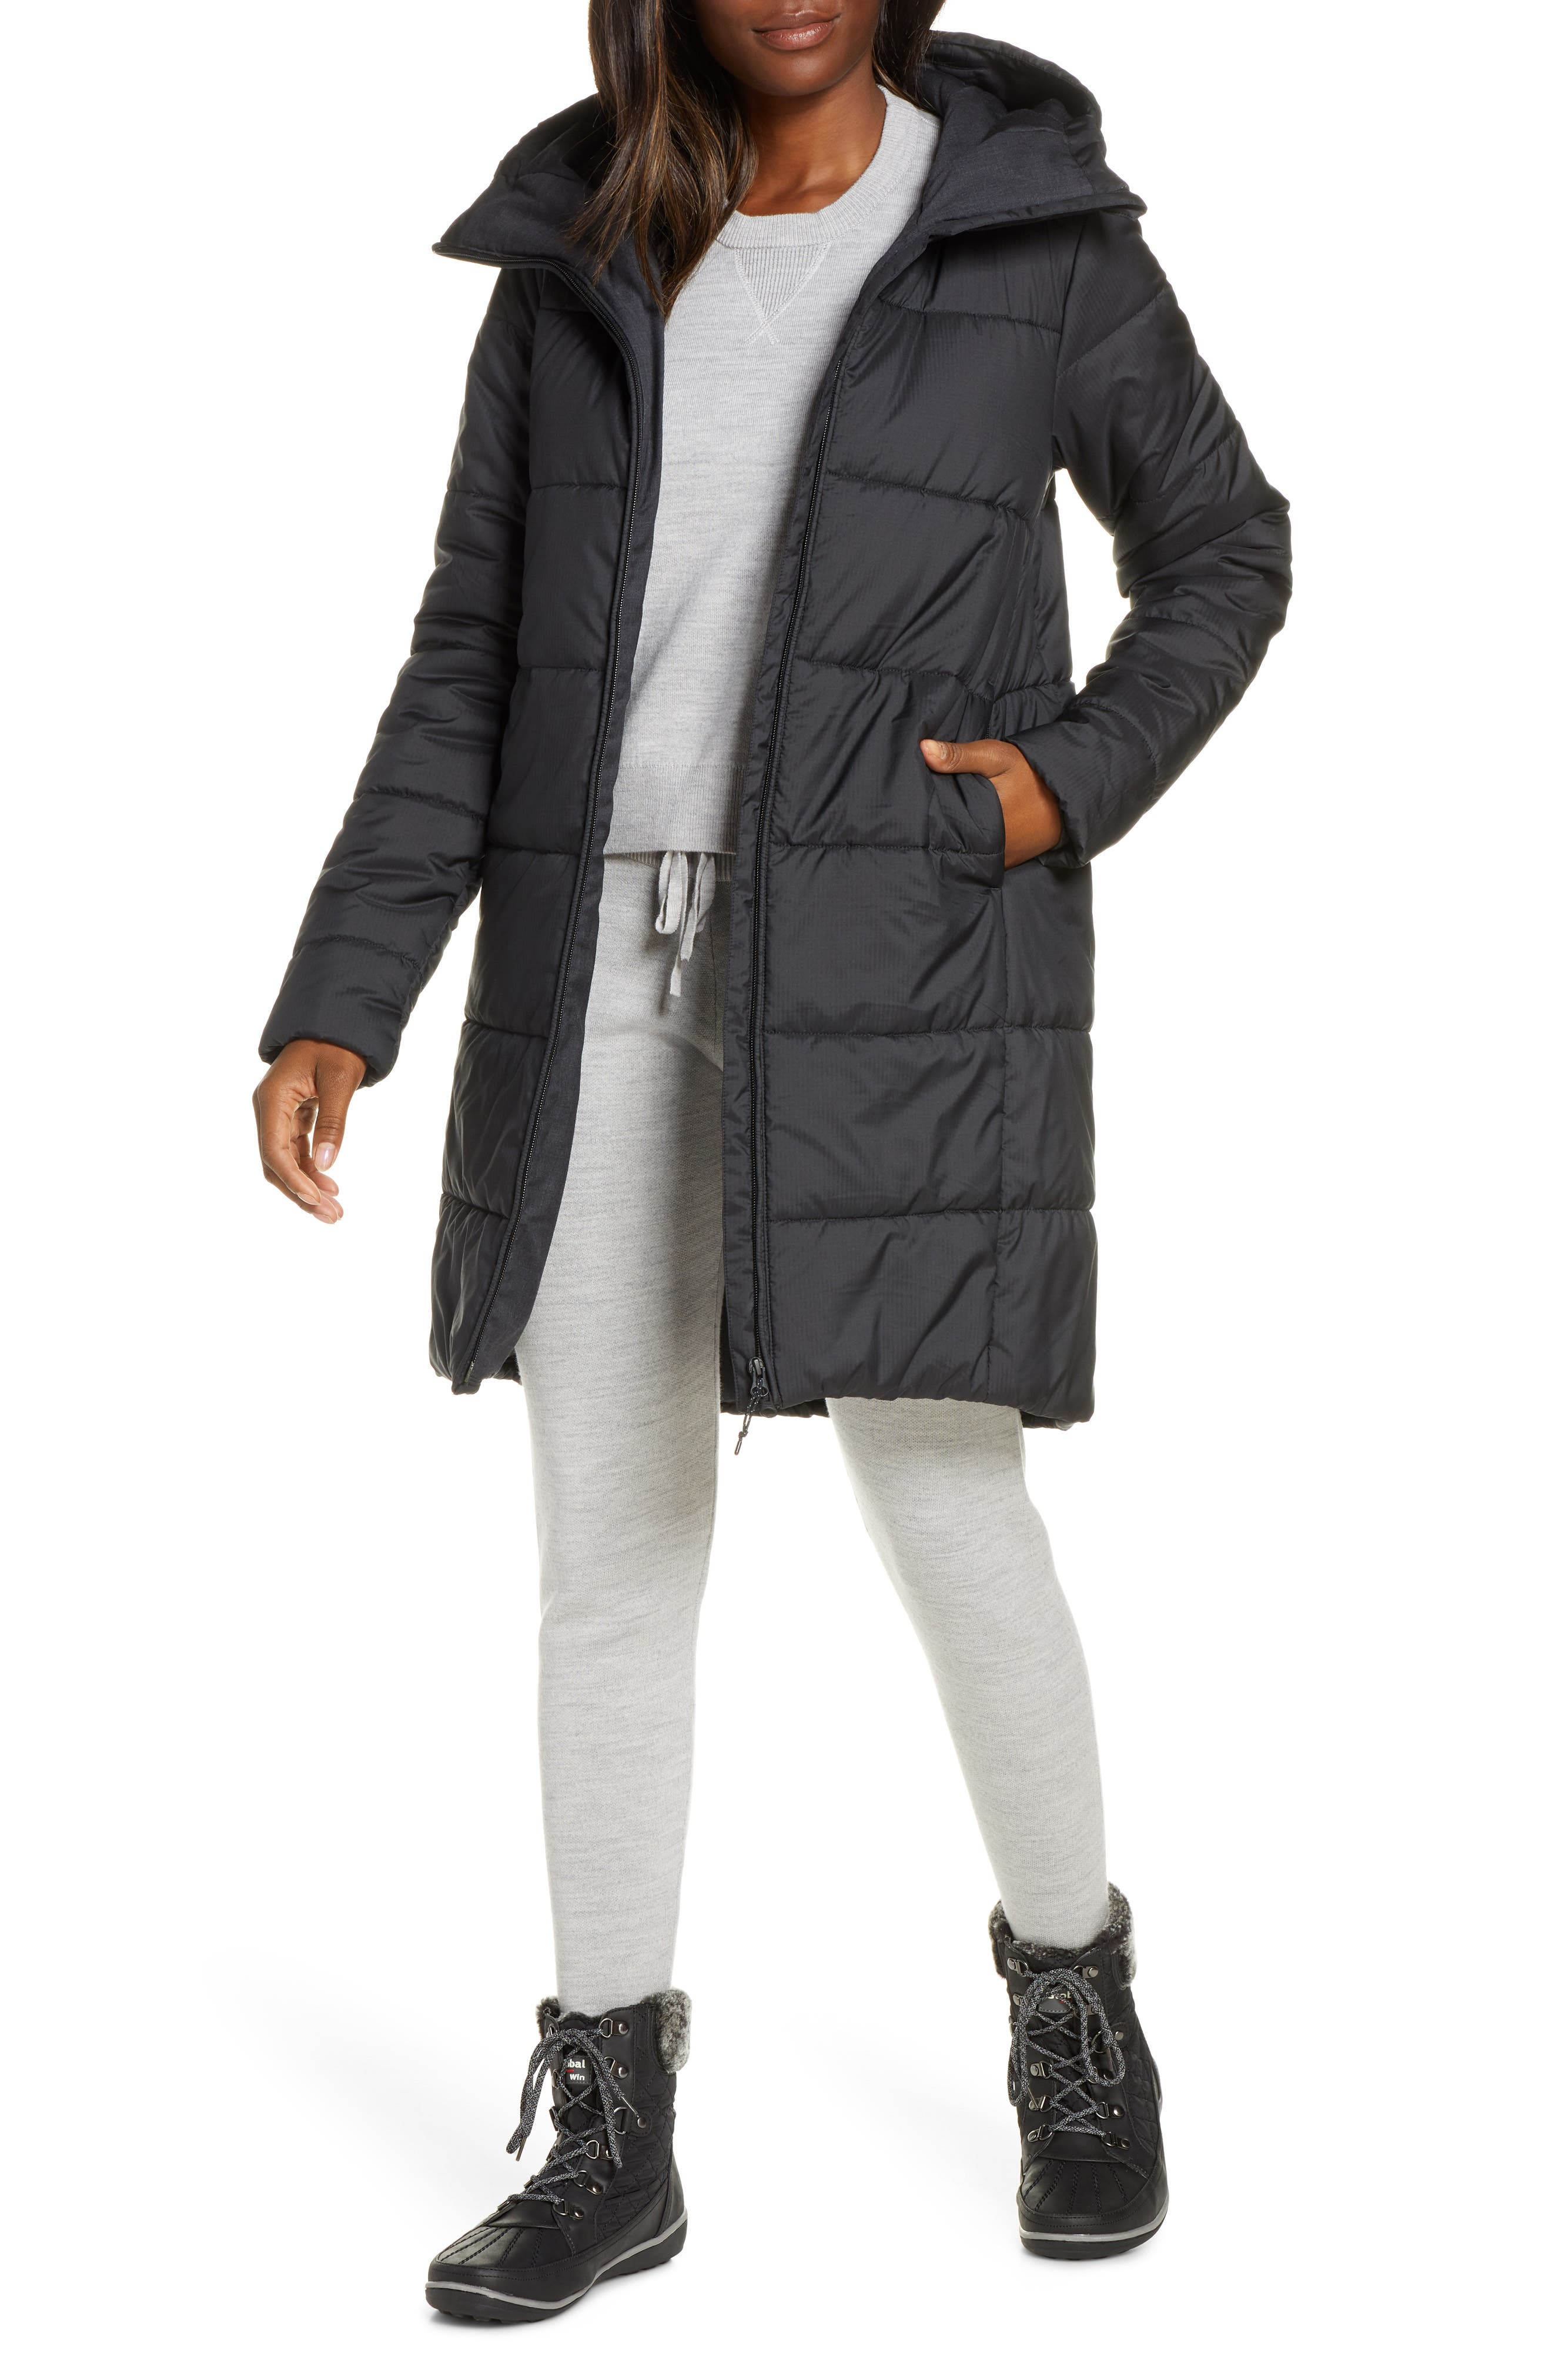 Collingwood 3Q Hooded Merinoloft(TM) Insulated Water Repellent Jacket